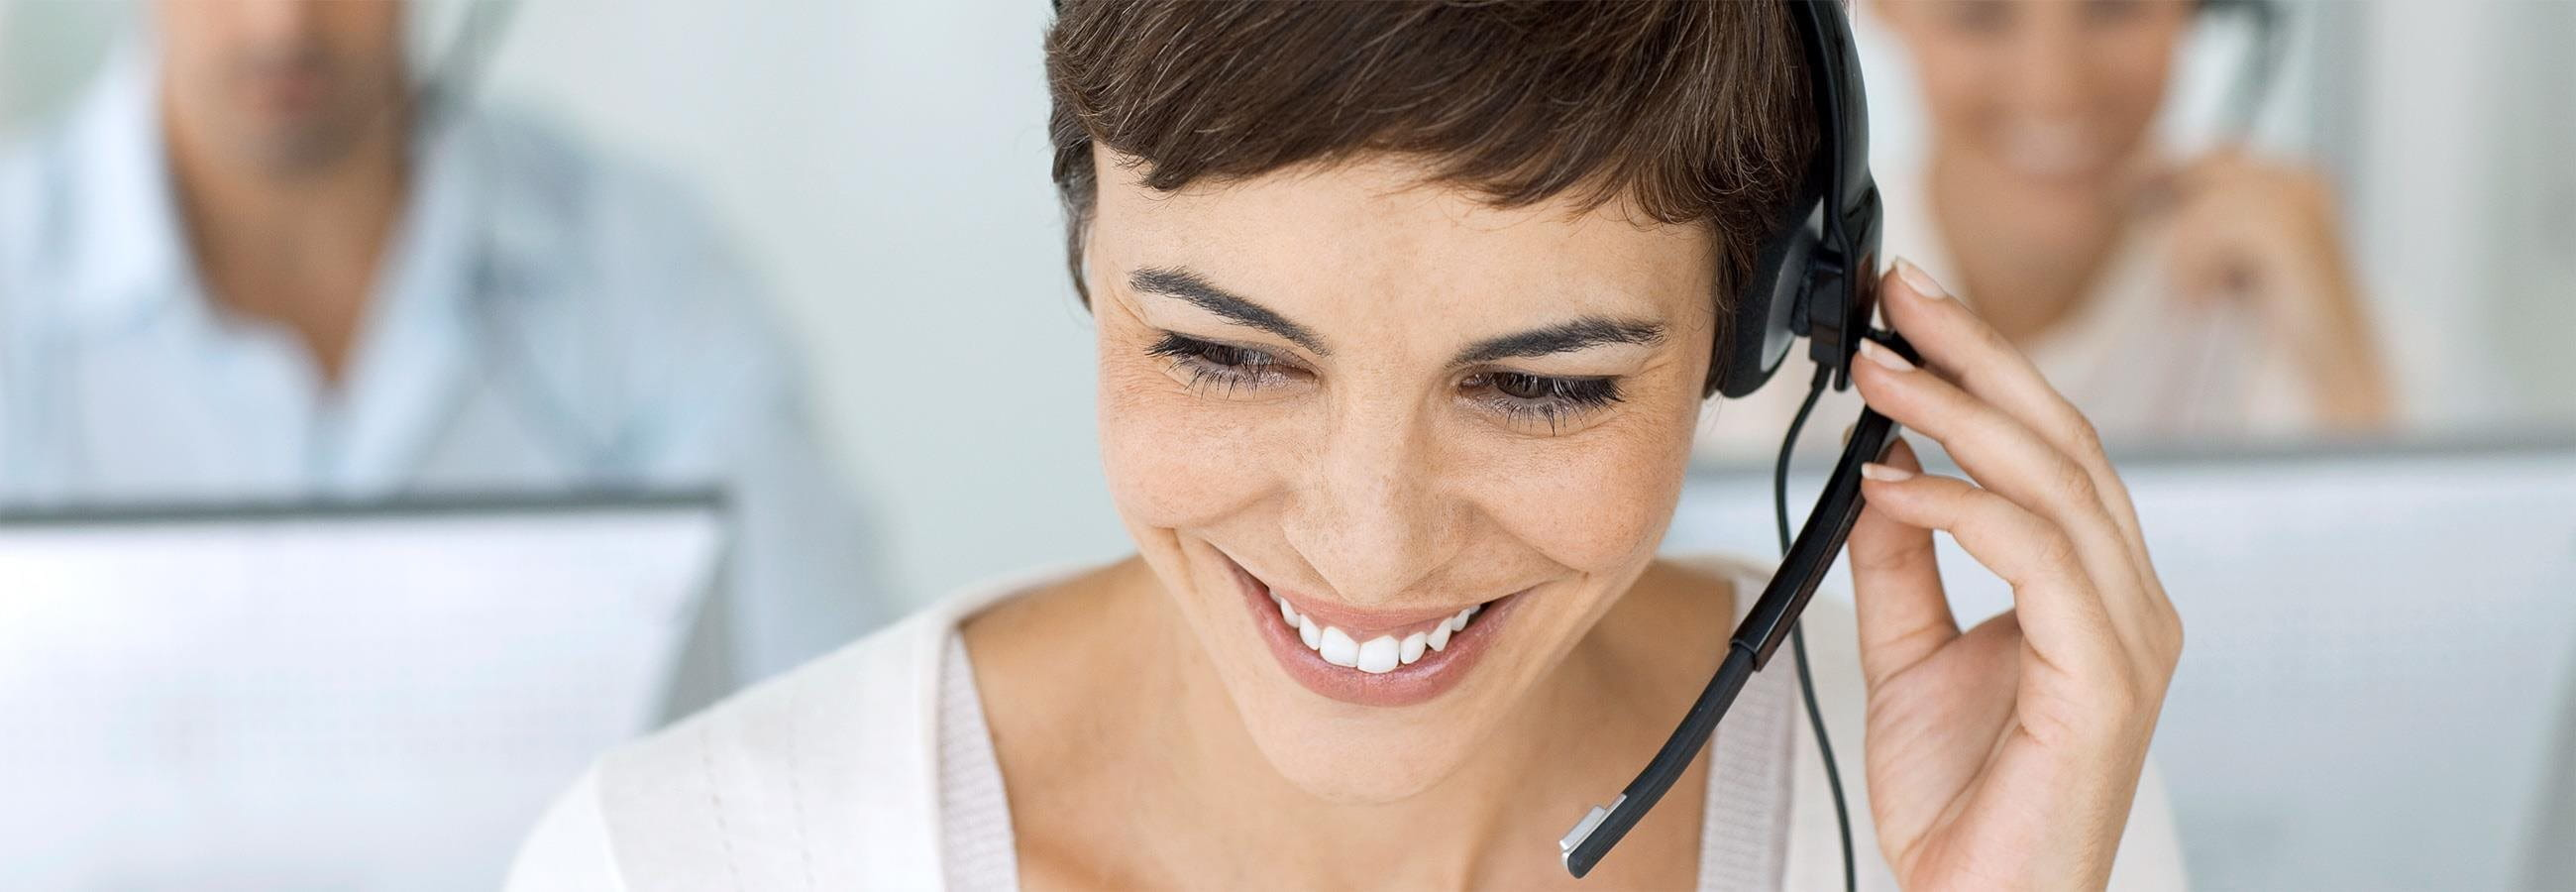 A woman wearing a headset.